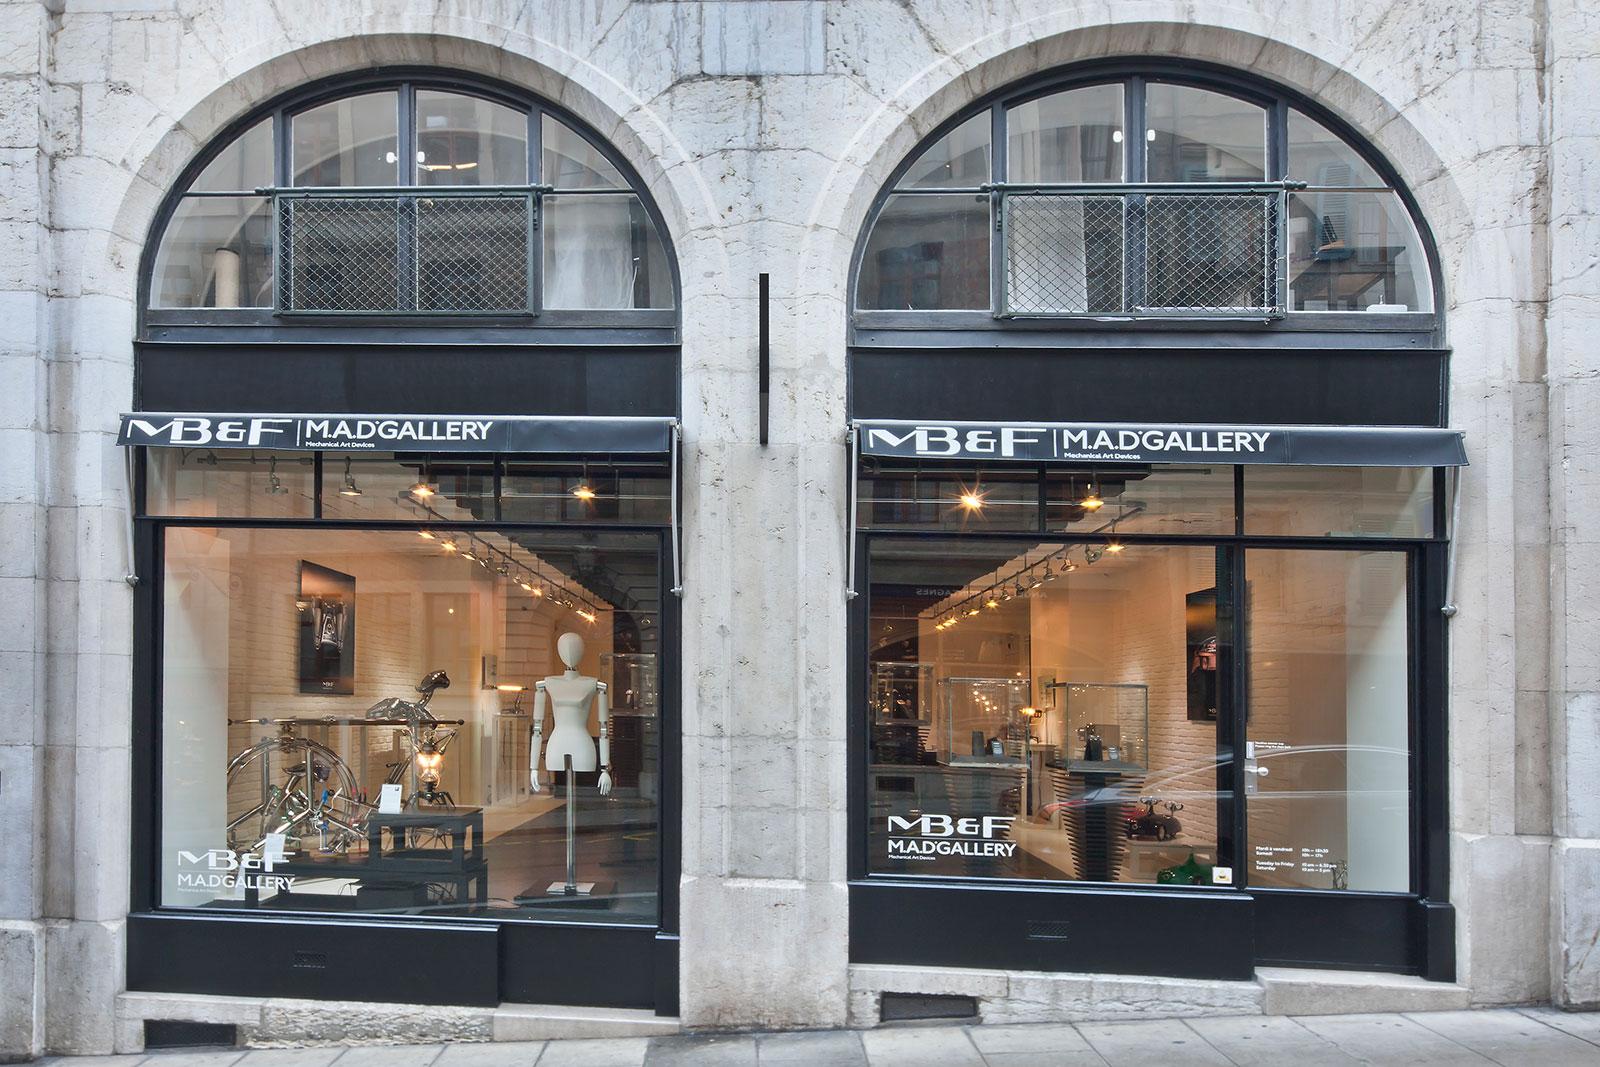 MB&F MAD Gallery Geneva 2